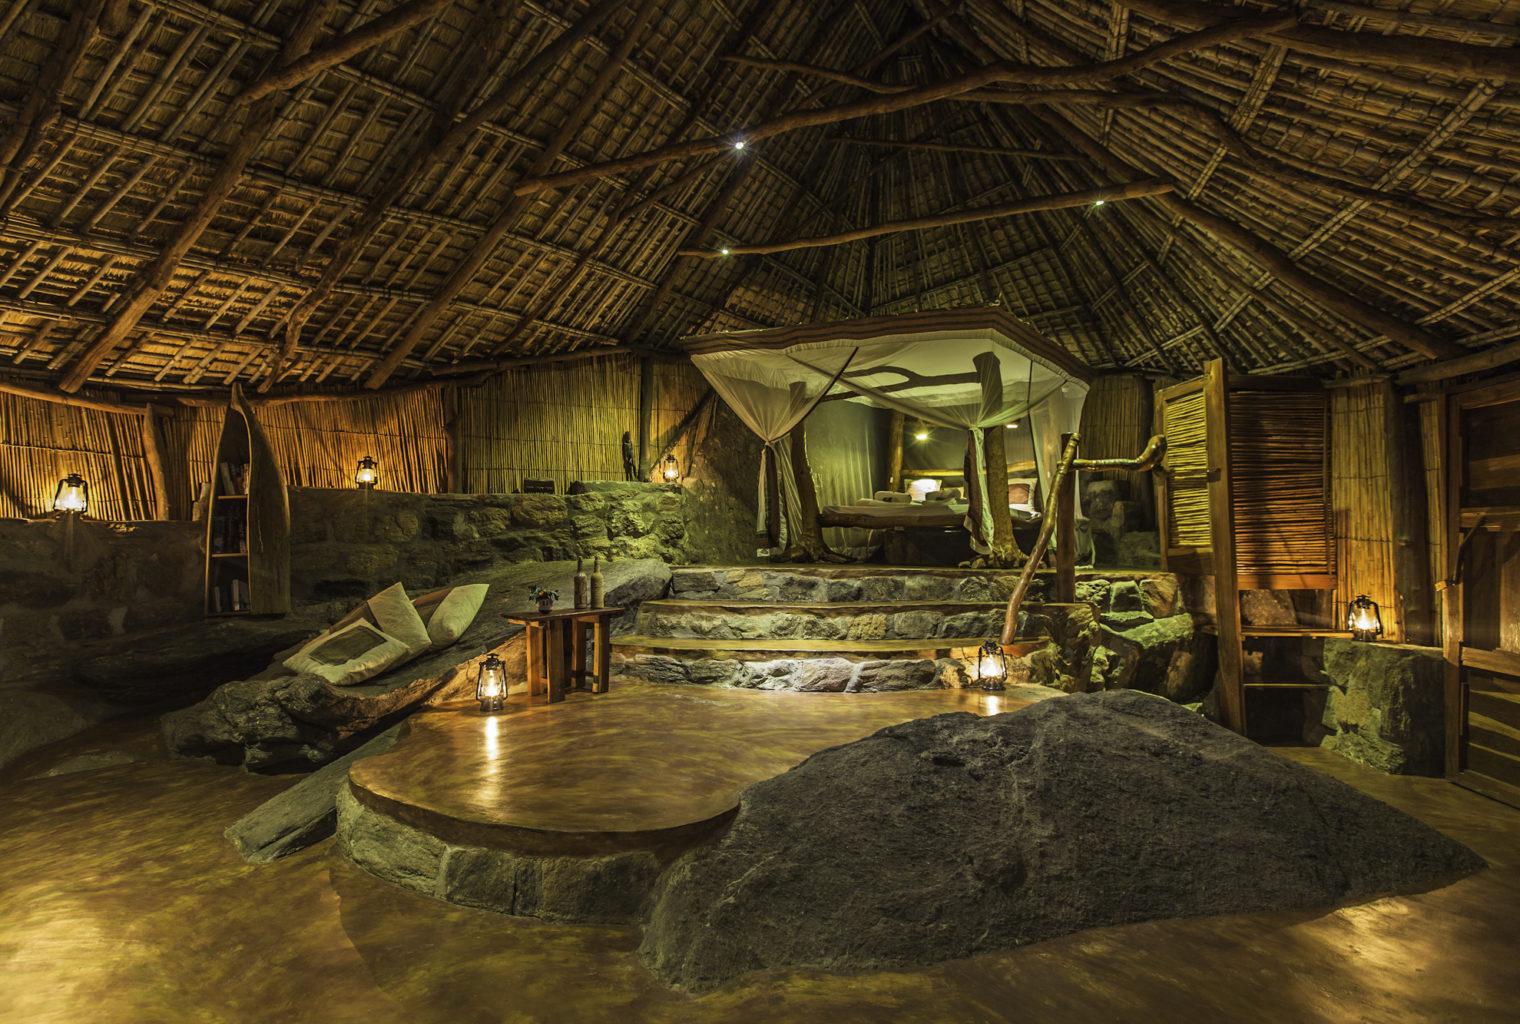 Nkwichi Lodge Malawi Starbed Interior